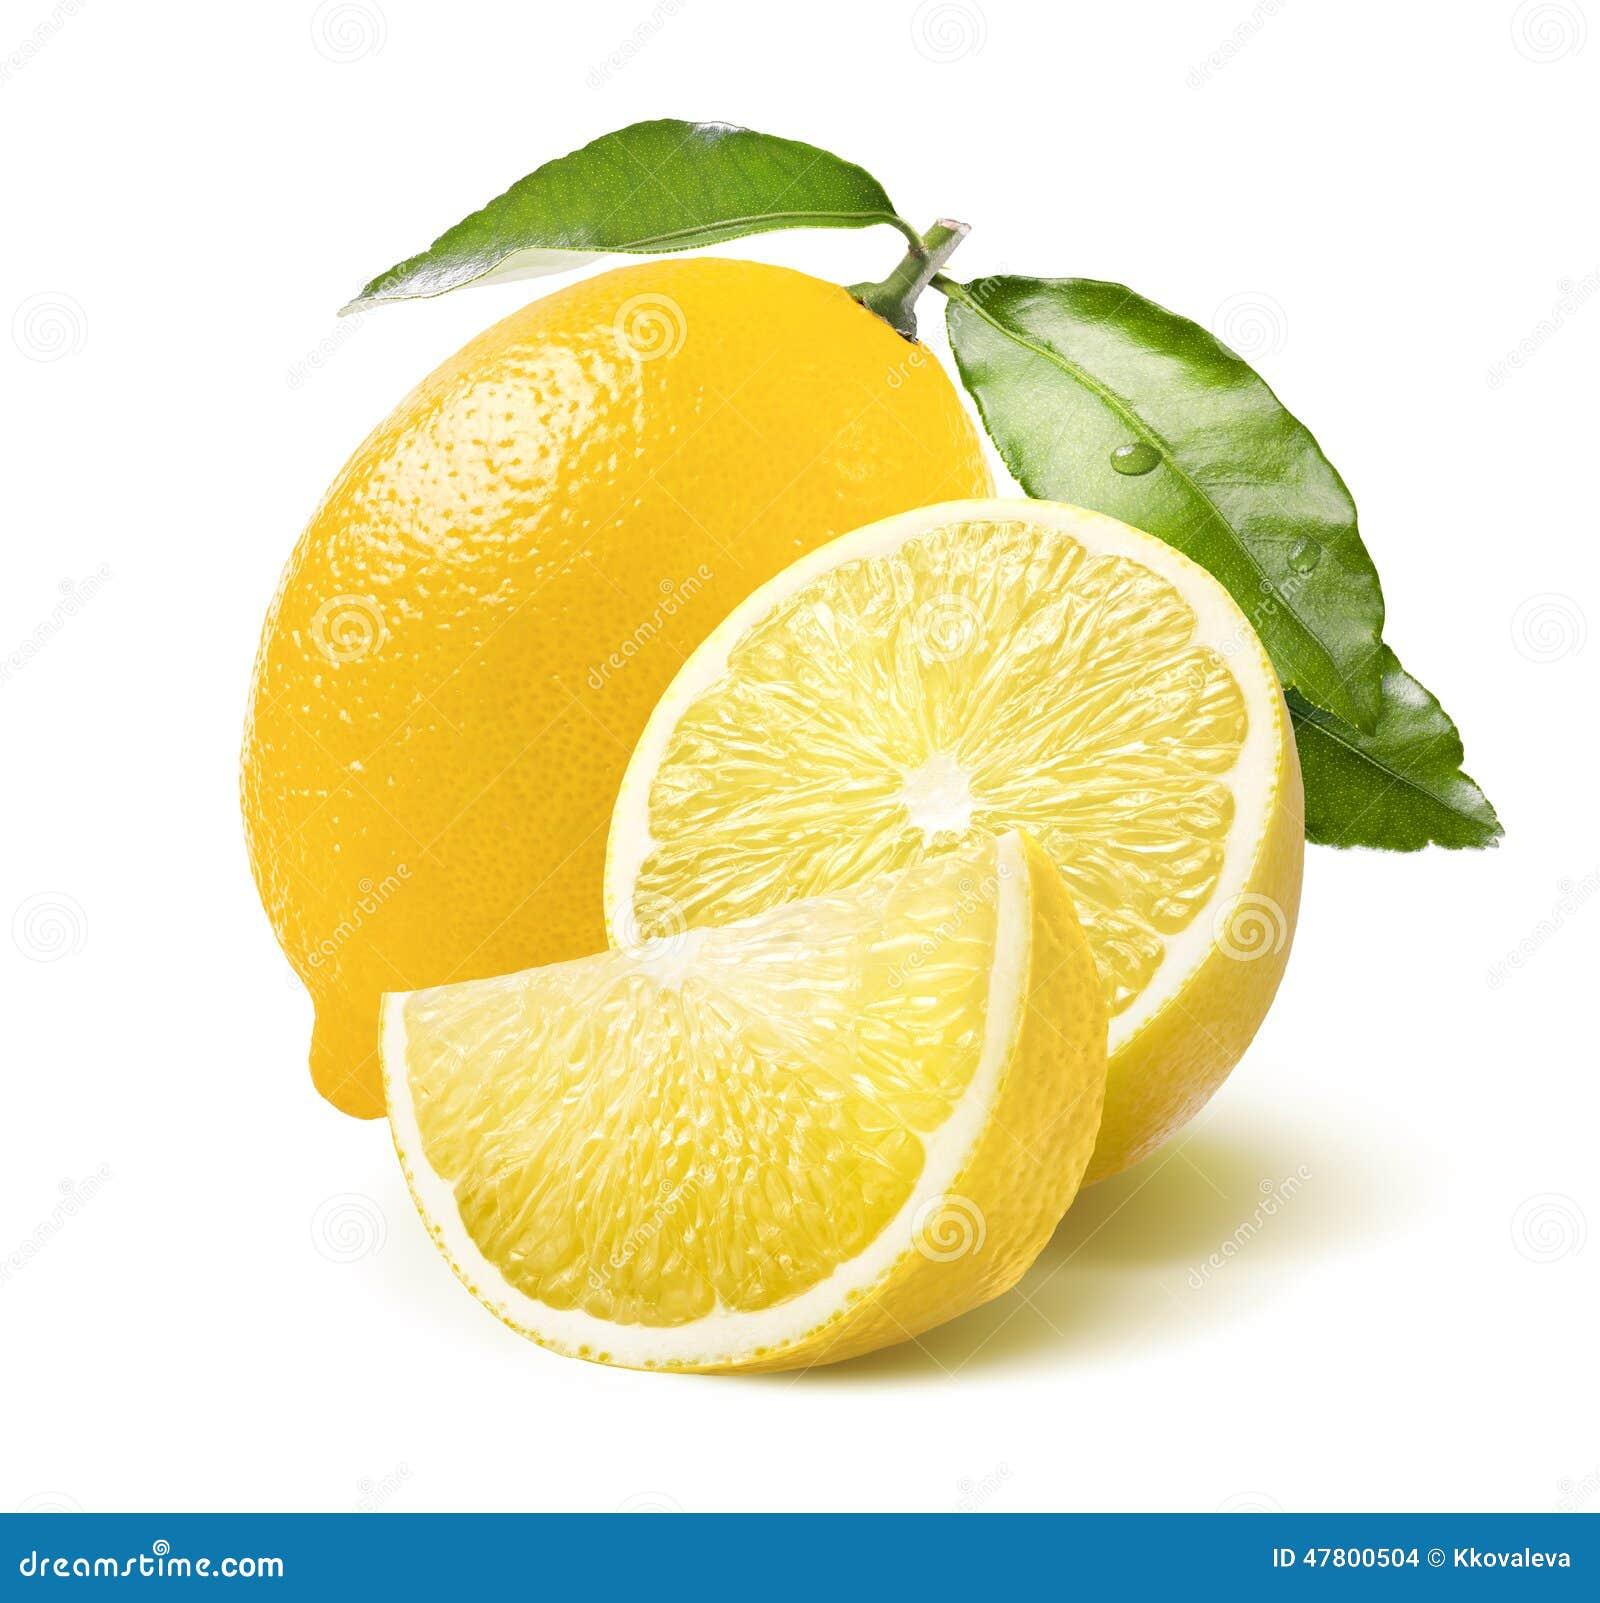 Whole lemon  half and quarter Quarter Lemon